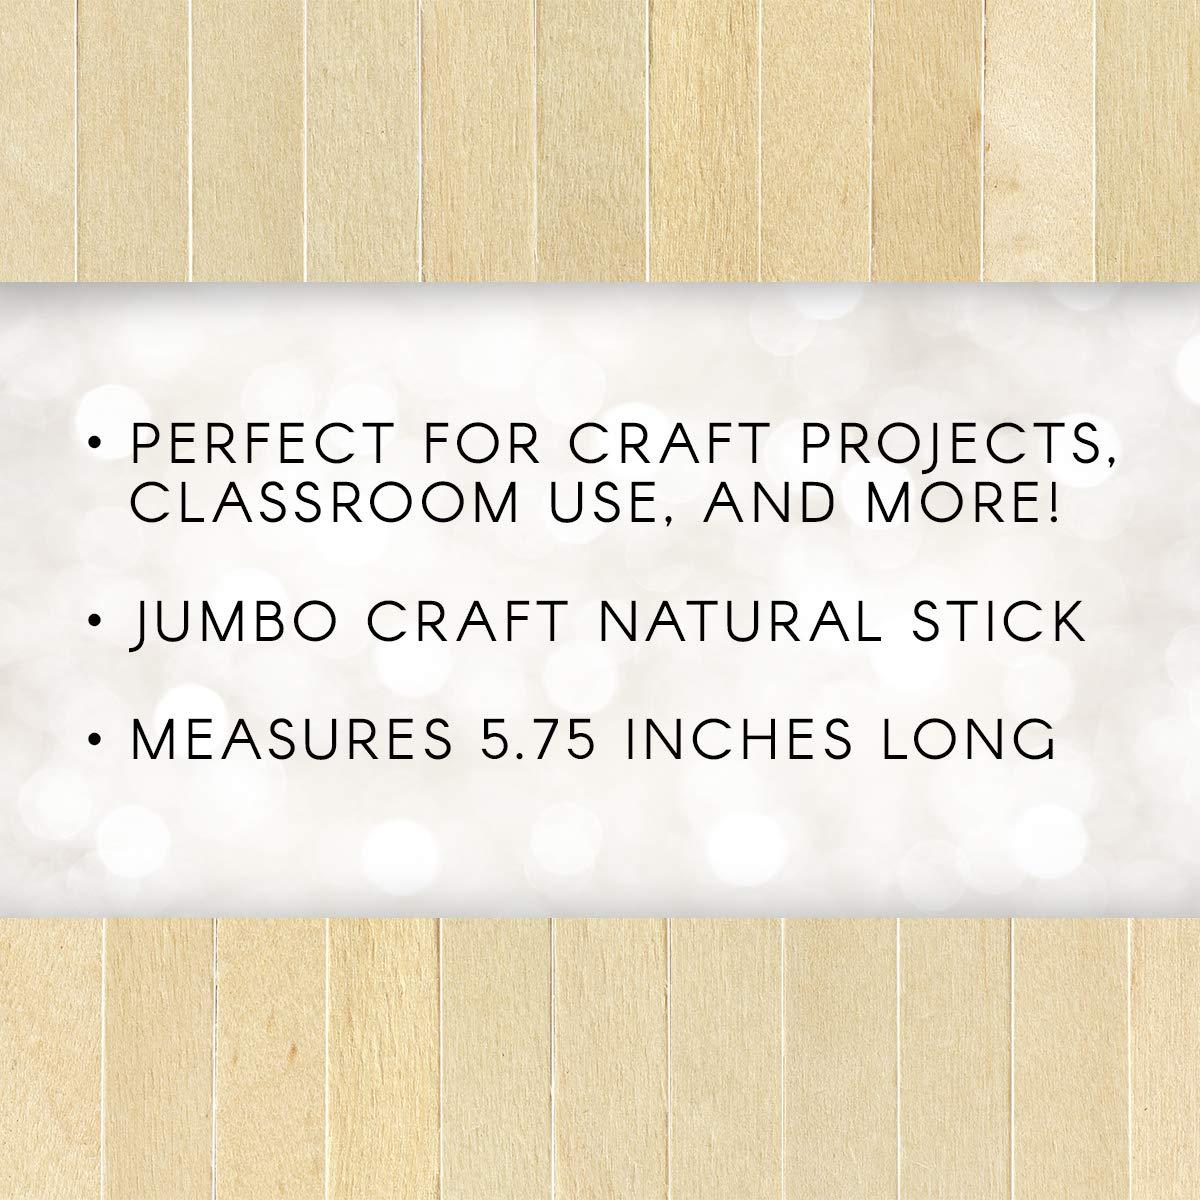 Darice 9150 85 80 Piece 5 frac34; inch Jumbo Natural Finish Craft Sticks